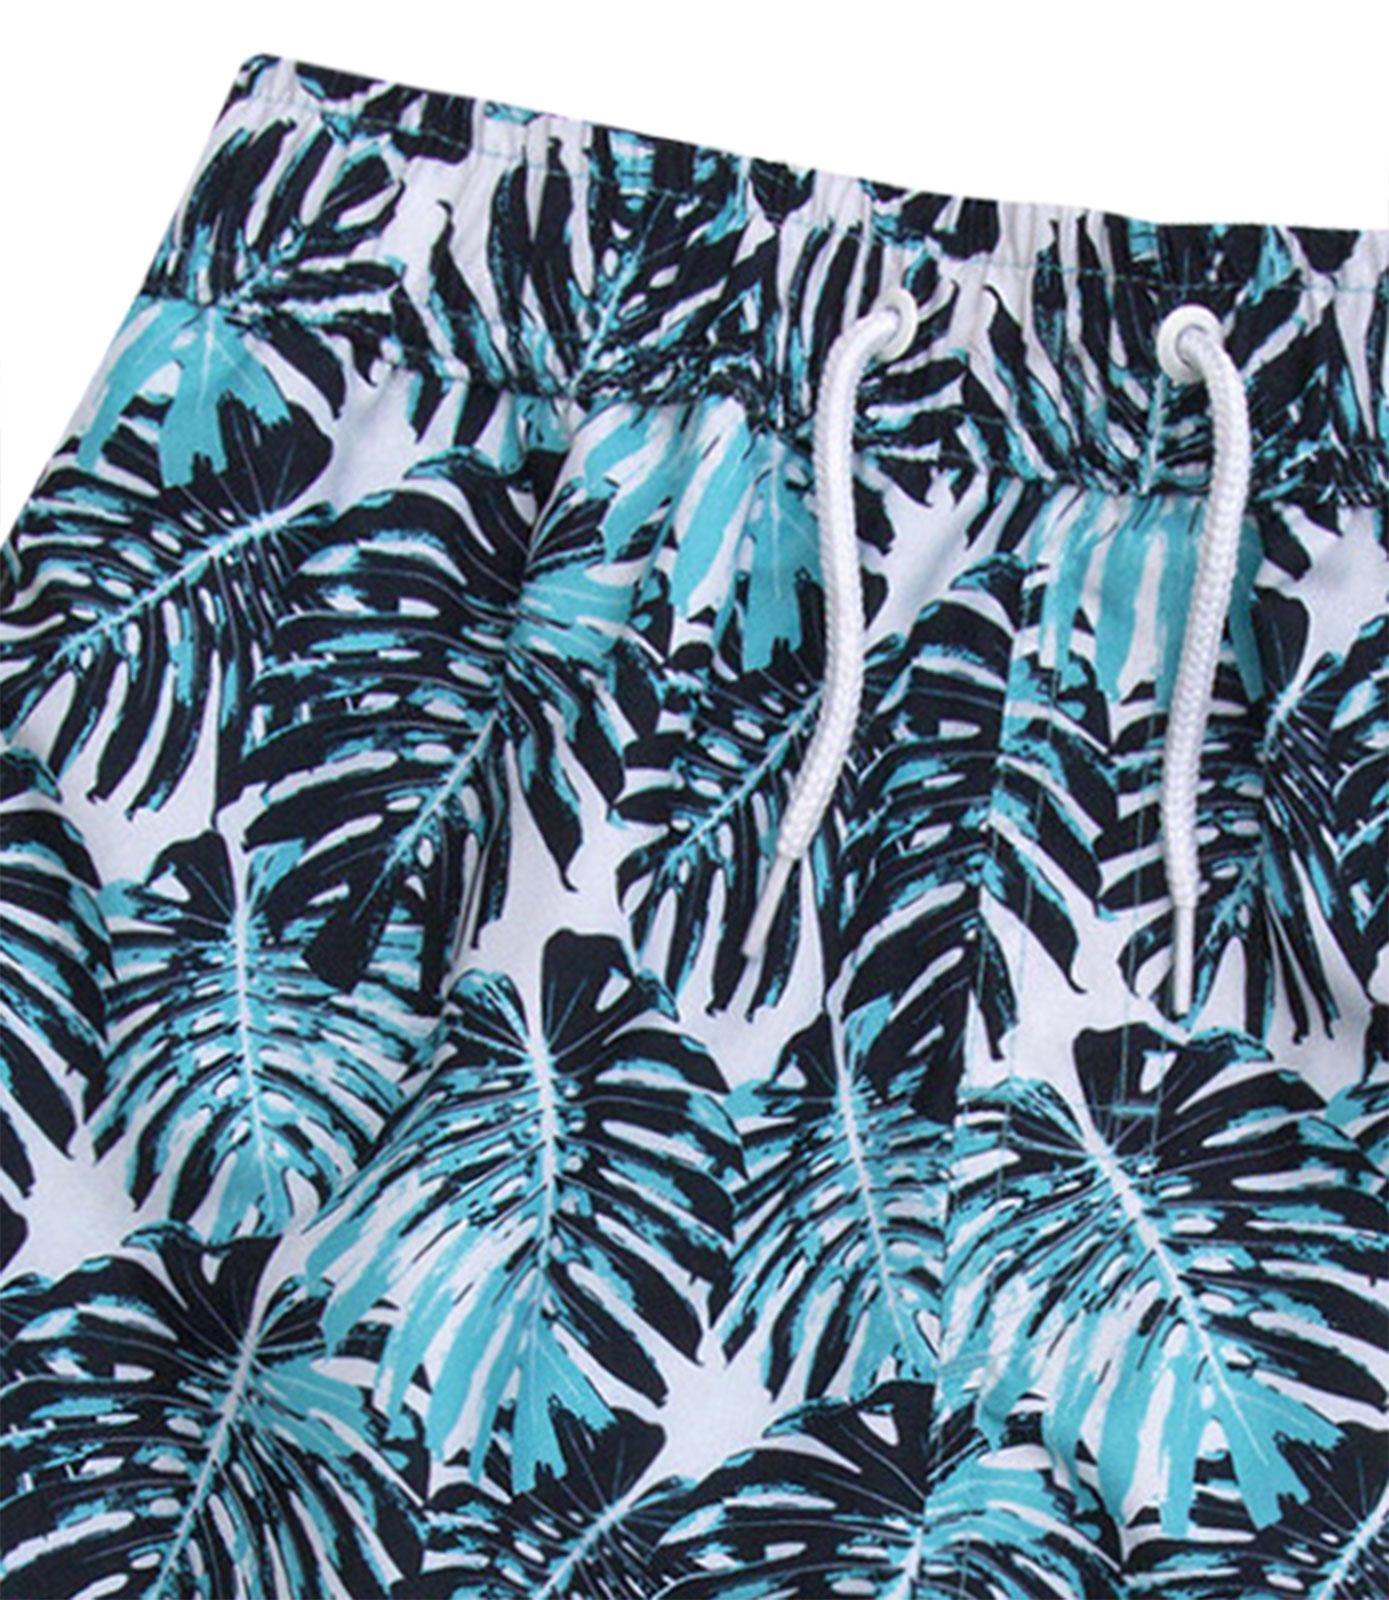 Boys-Swimming-Shorts-Kids-Bermuda-Holiday-Trunks-2-3-4-5-6-7-8-9-10-11-12-13-Yrs thumbnail 3